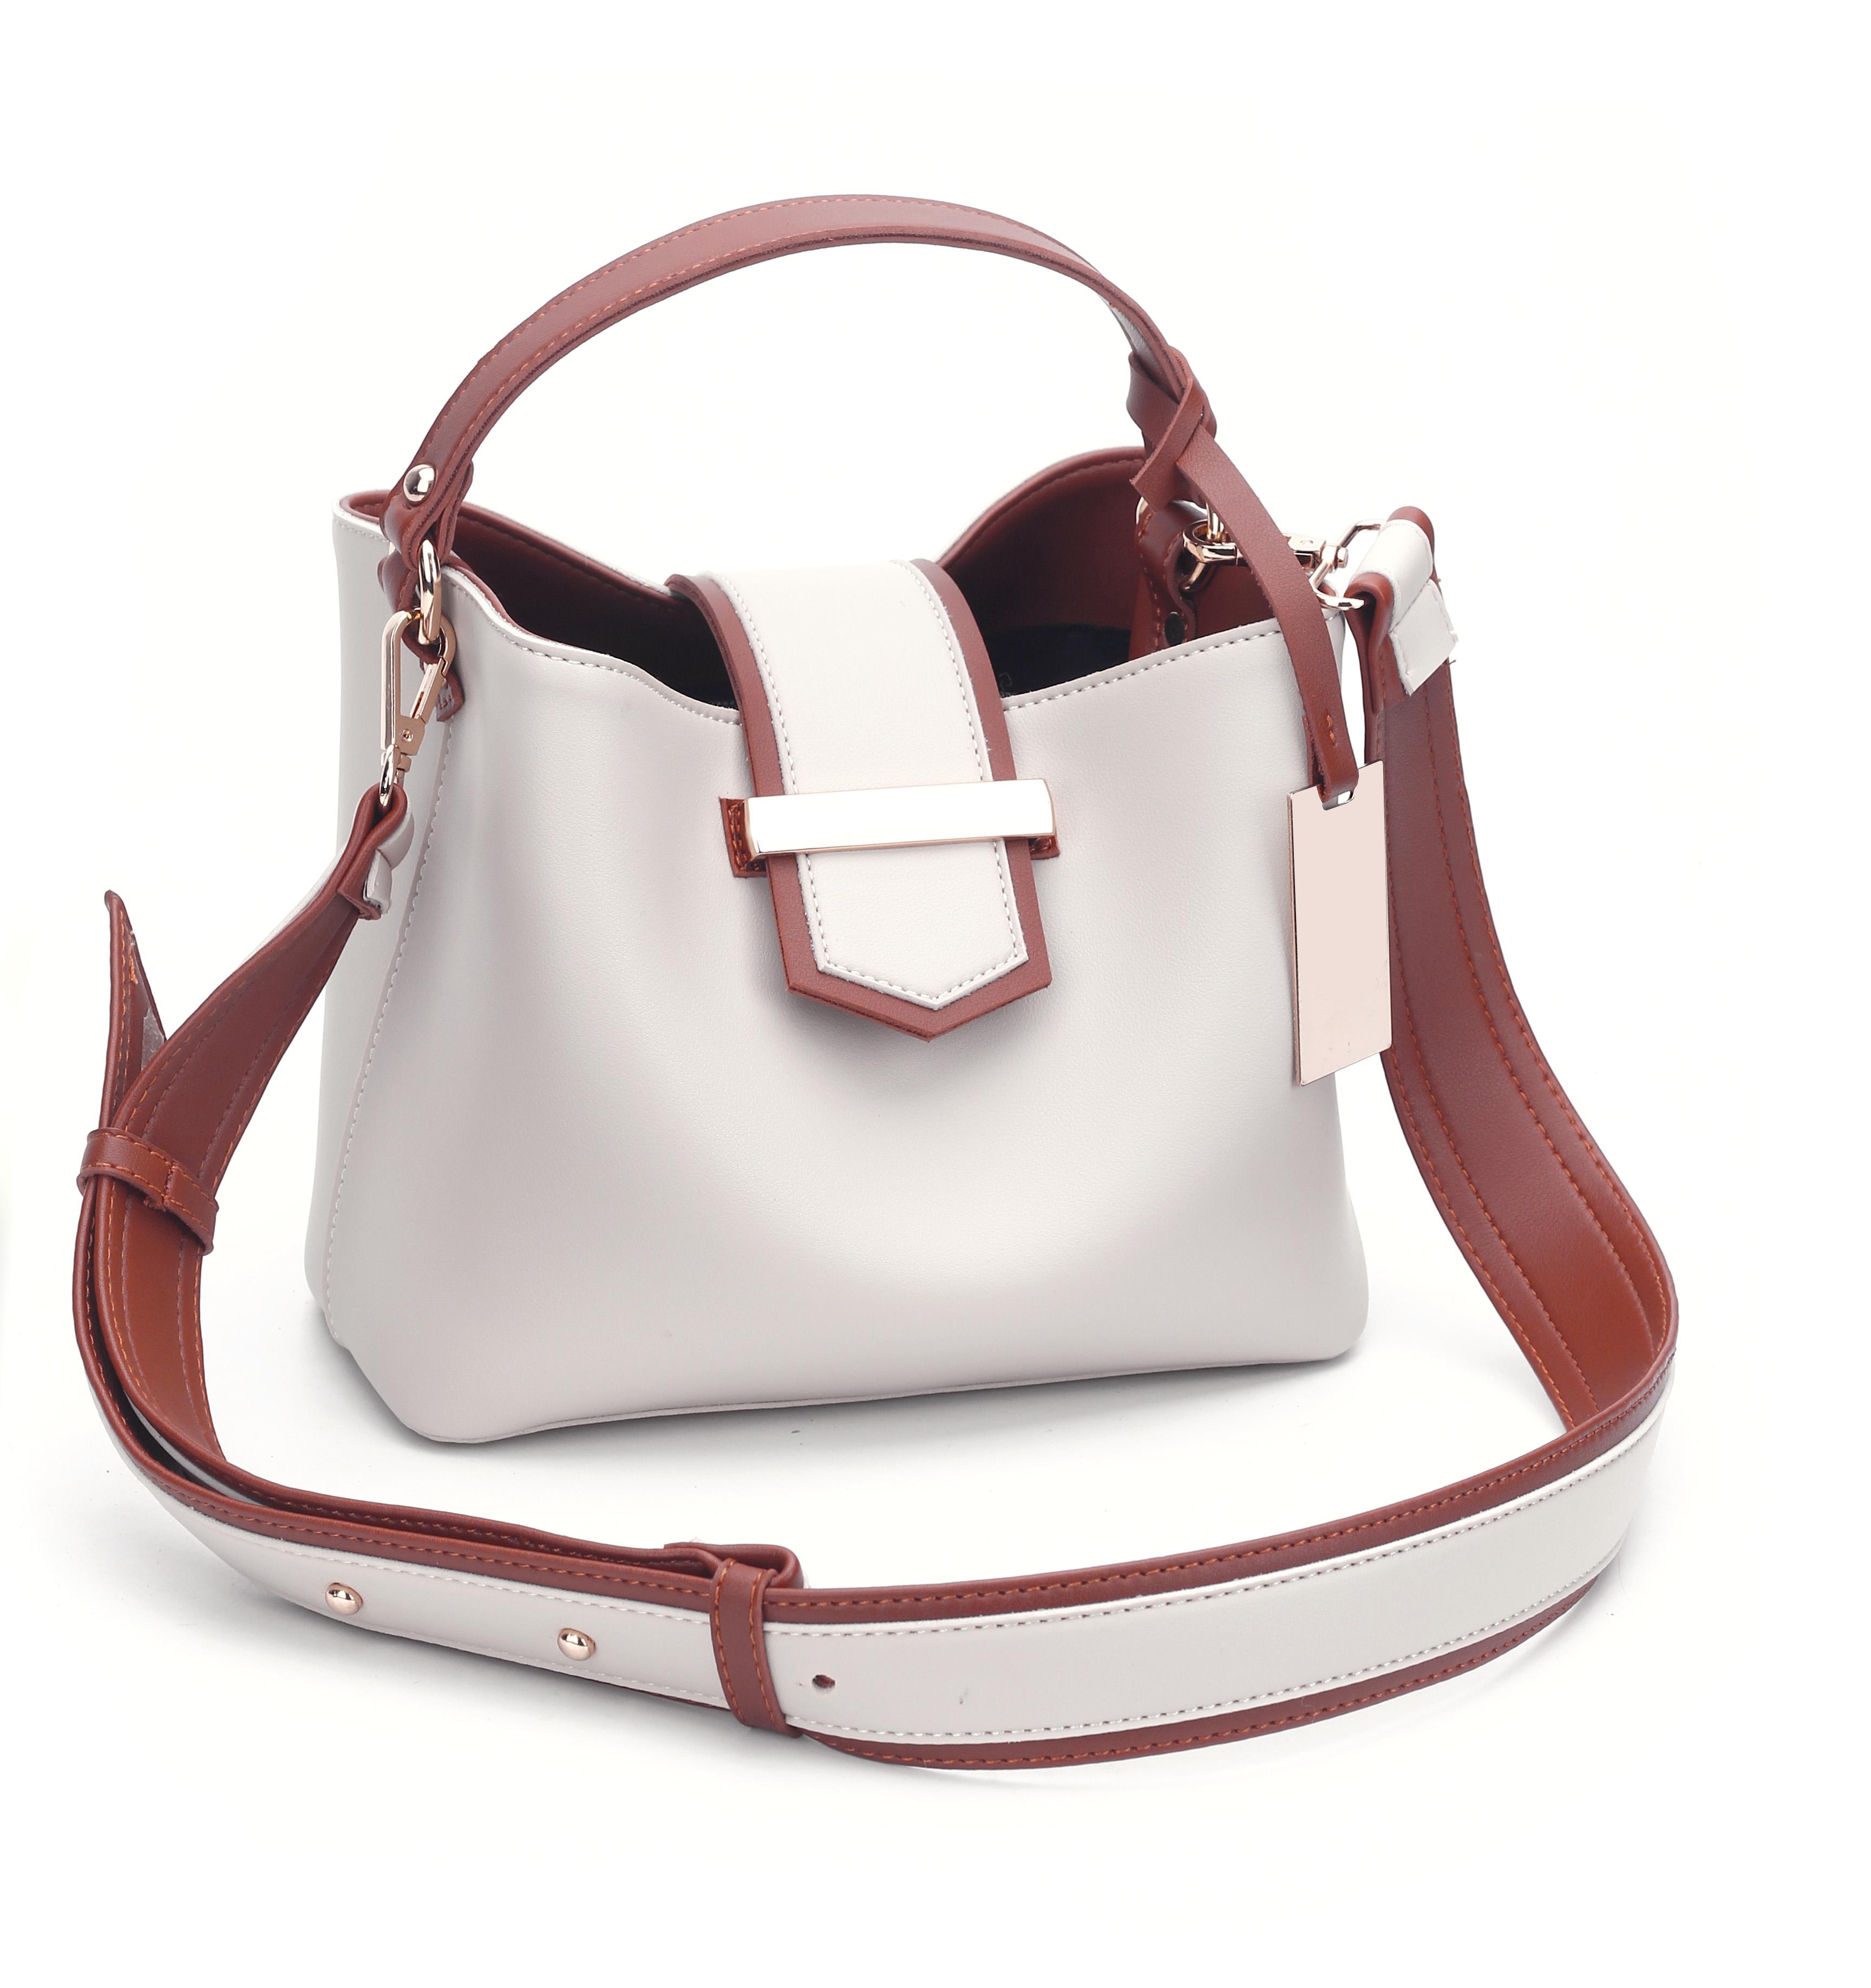 25c18e929e88b8 China ladies bag no brand wholesale 🇨🇳 - Alibaba